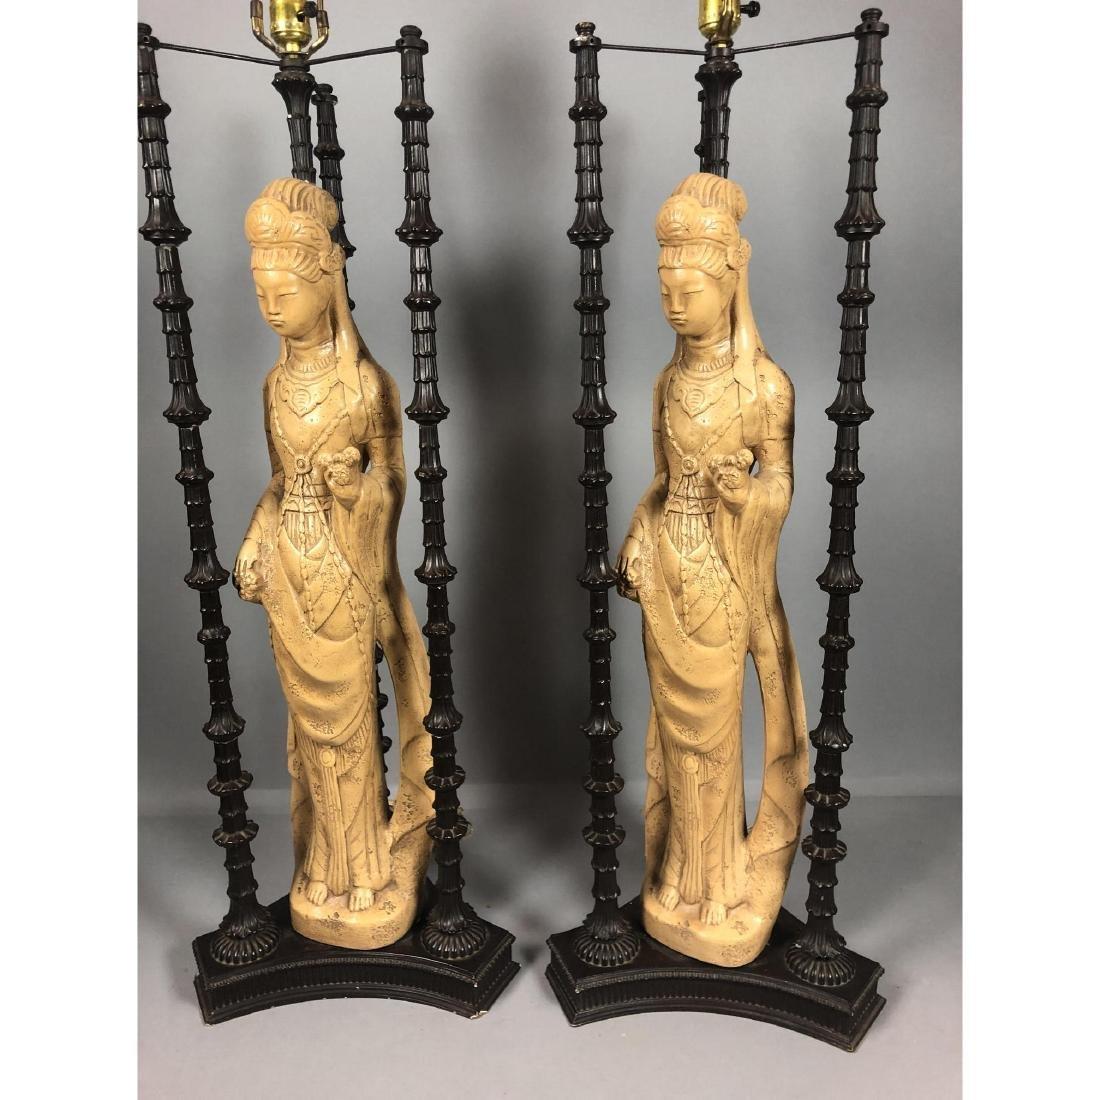 Pr James Mont Style Plaster Metal Figural Lamps.